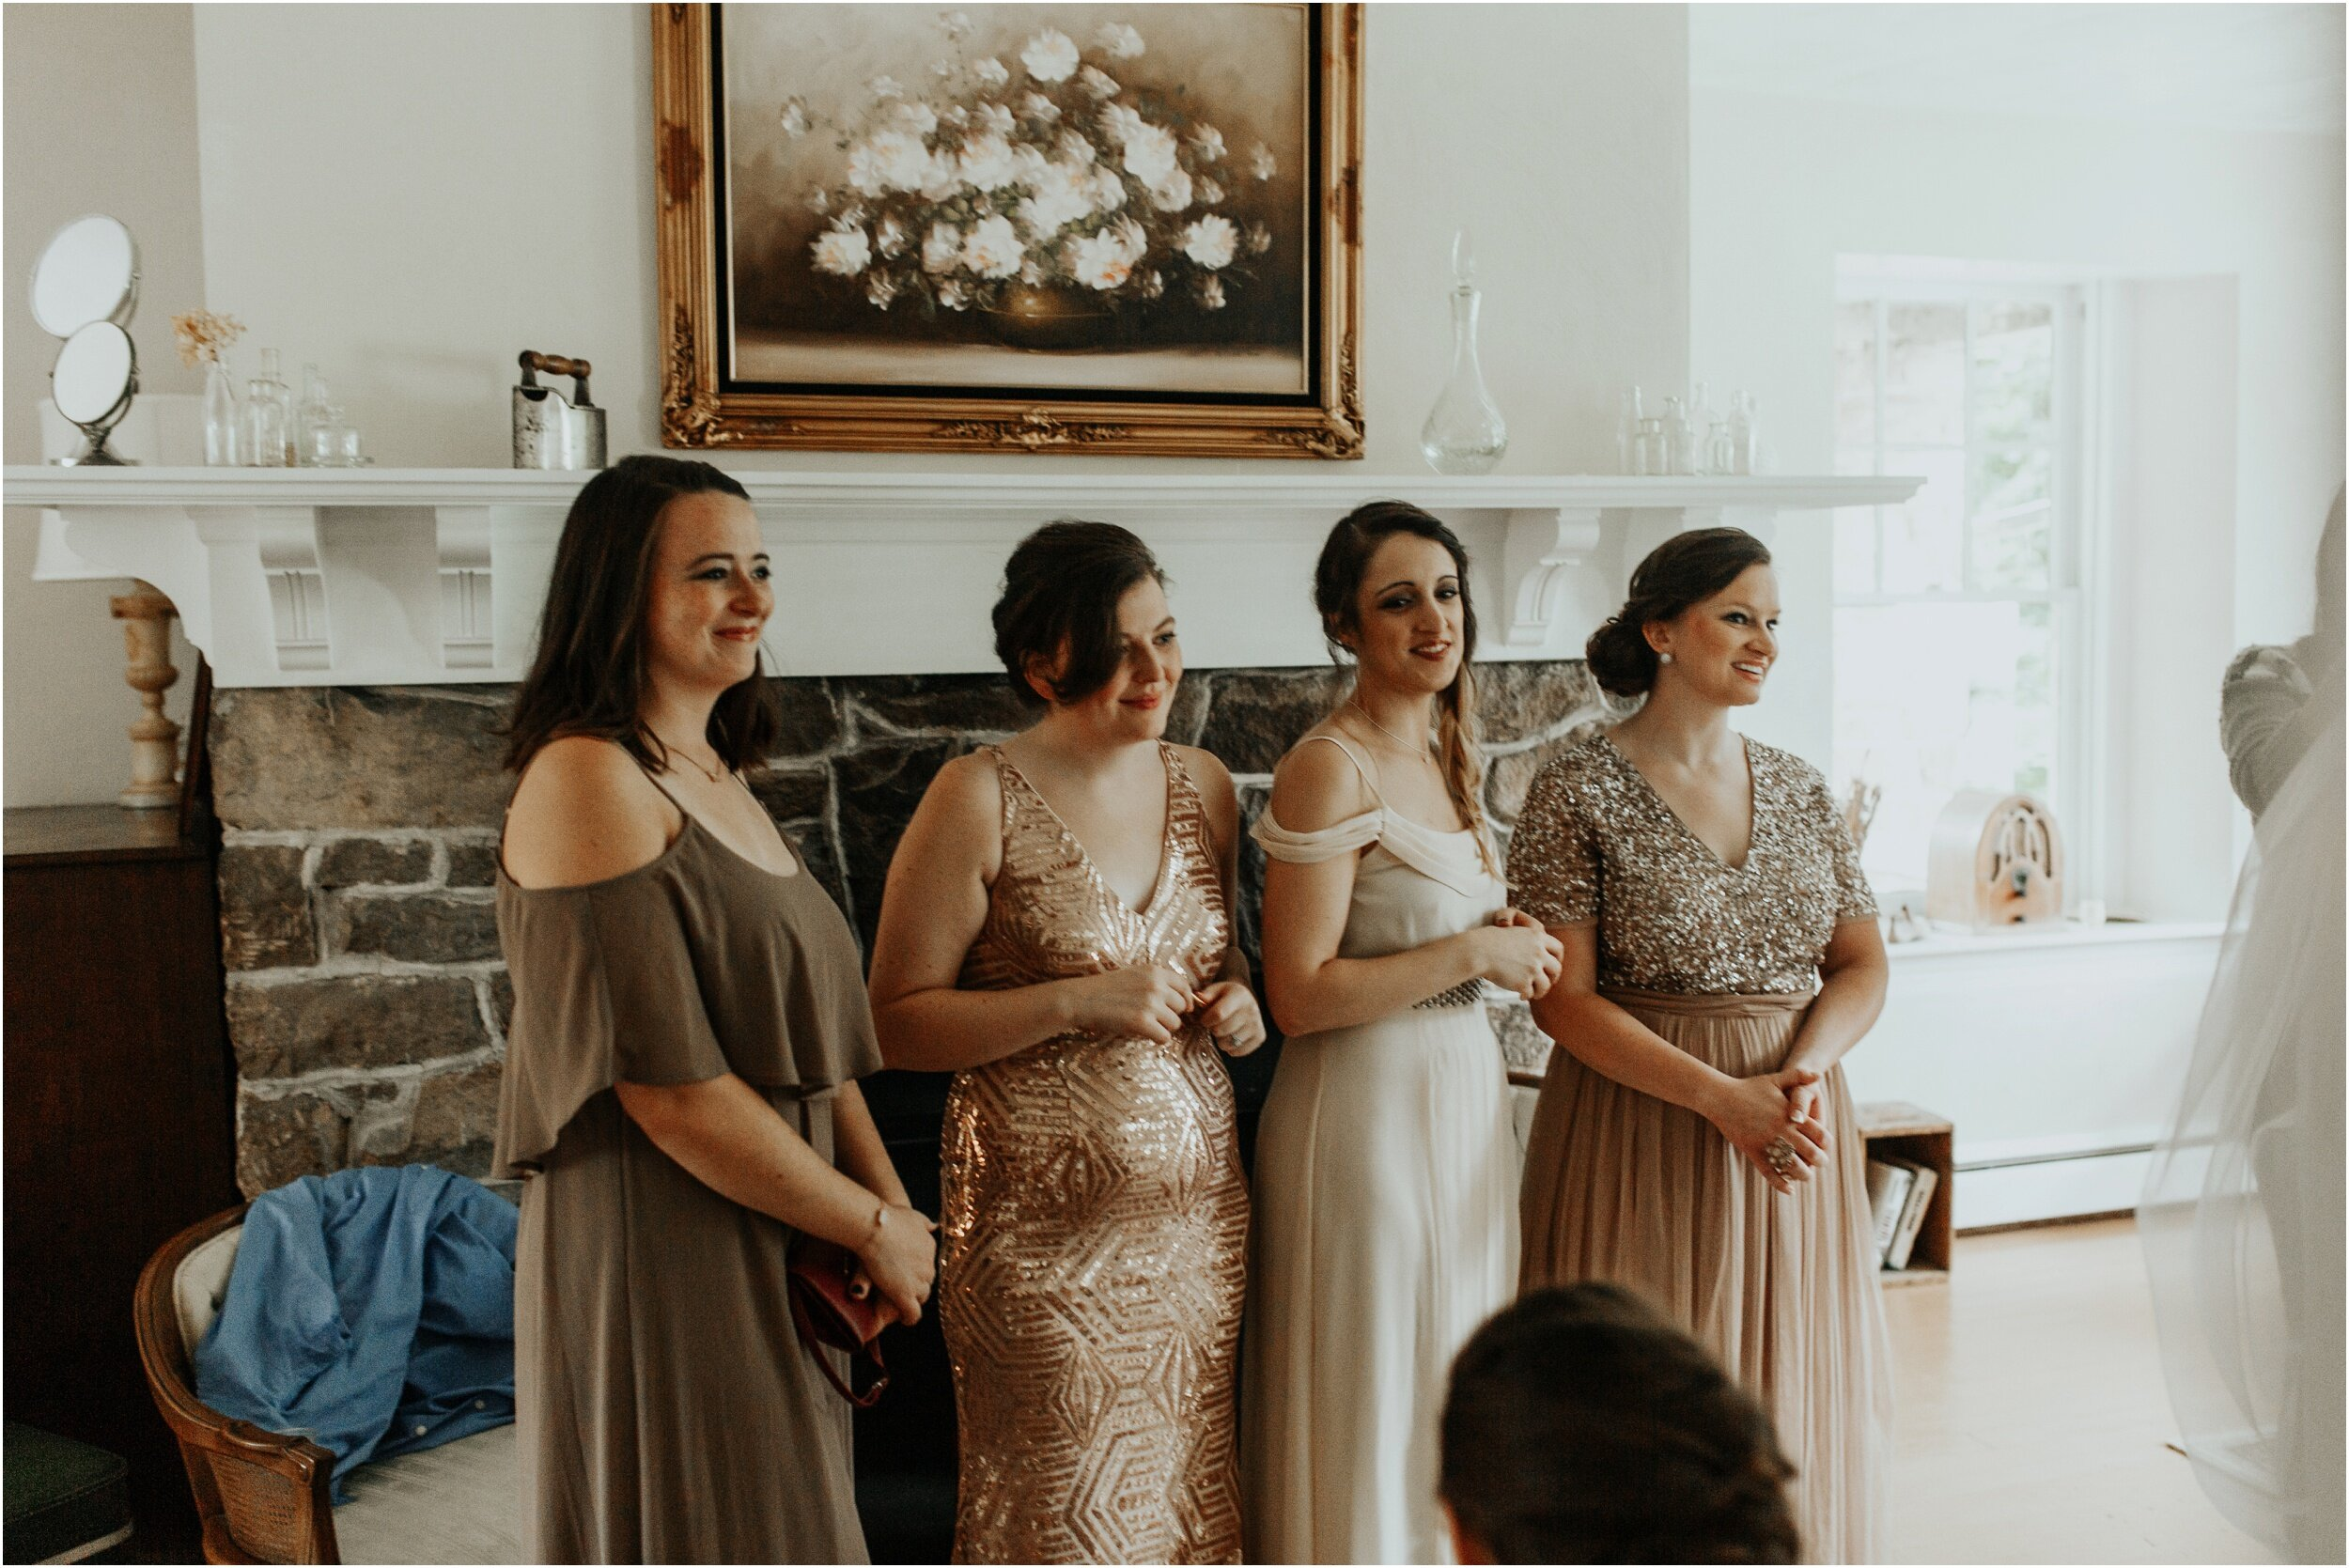 steph-and-jordan-cox-our-wedding-historic-shady-lane-compass-wedding-collective-hazel-lining-photography-destination-elopement-wedding-engagement-photography_0016.jpg